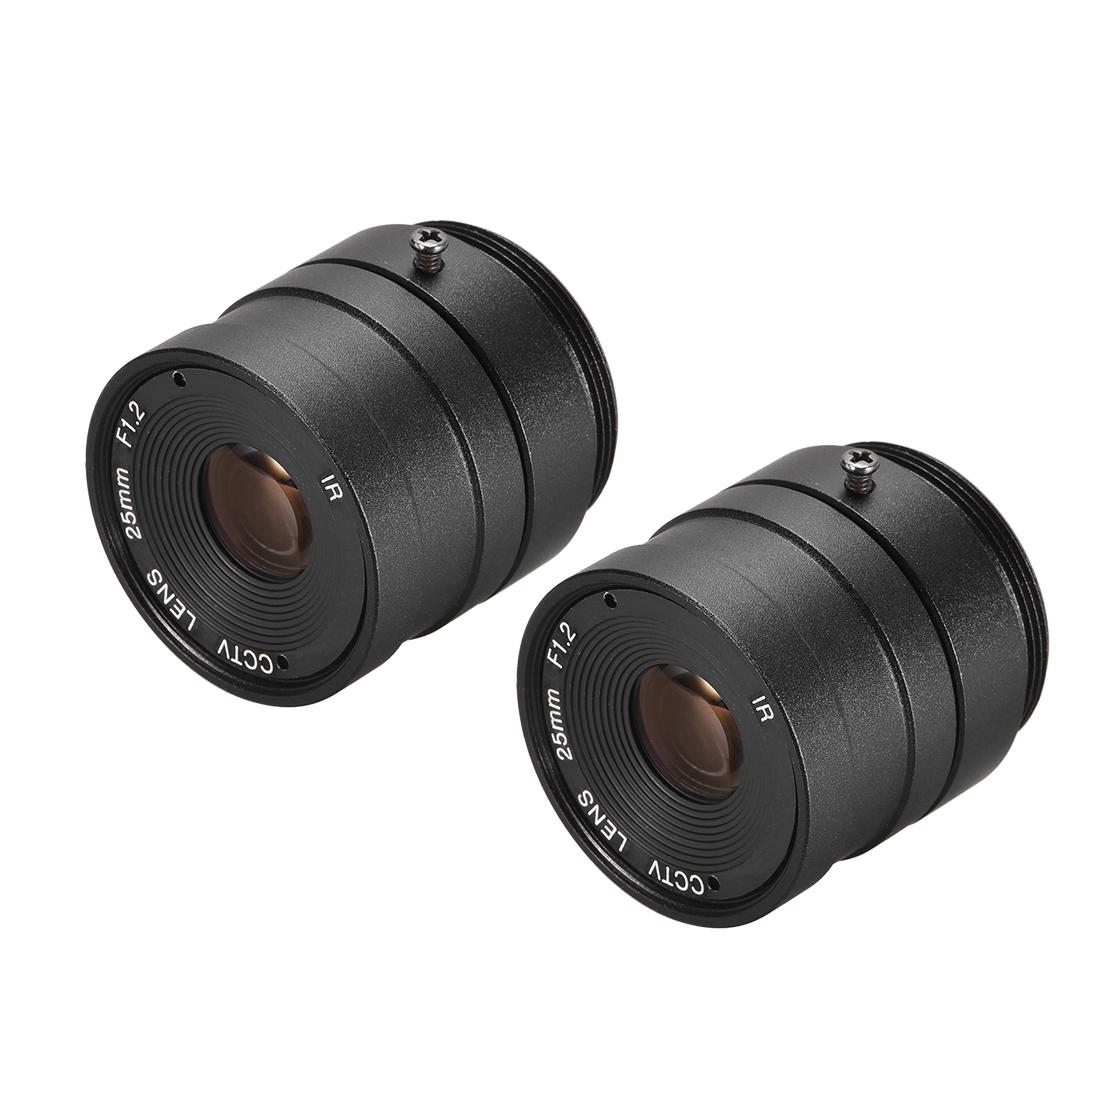 2 Pcs Camera Varifocal Lens 25mm Focal Length 720P F1.2 1/3 Inch CS Mount